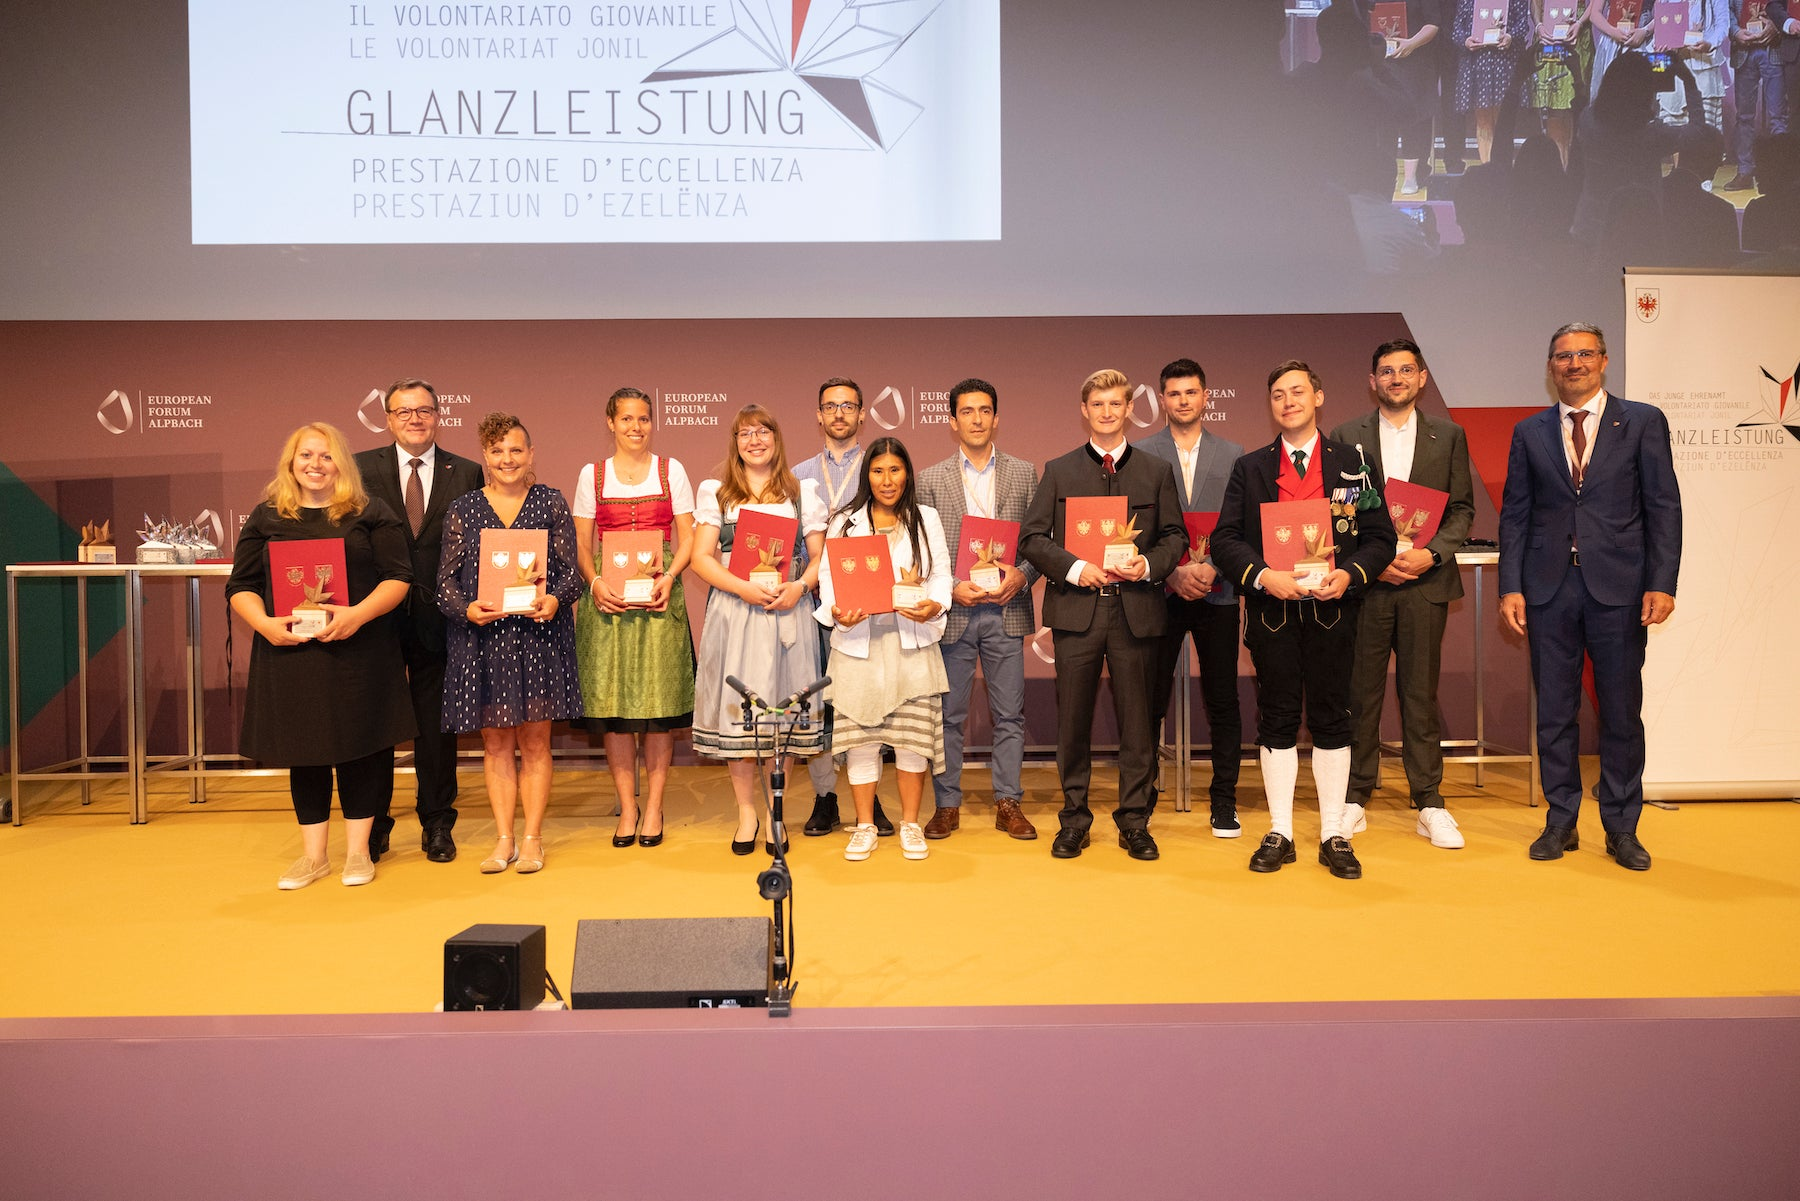 Volontariato giovanile Alto Adige-Tirolo